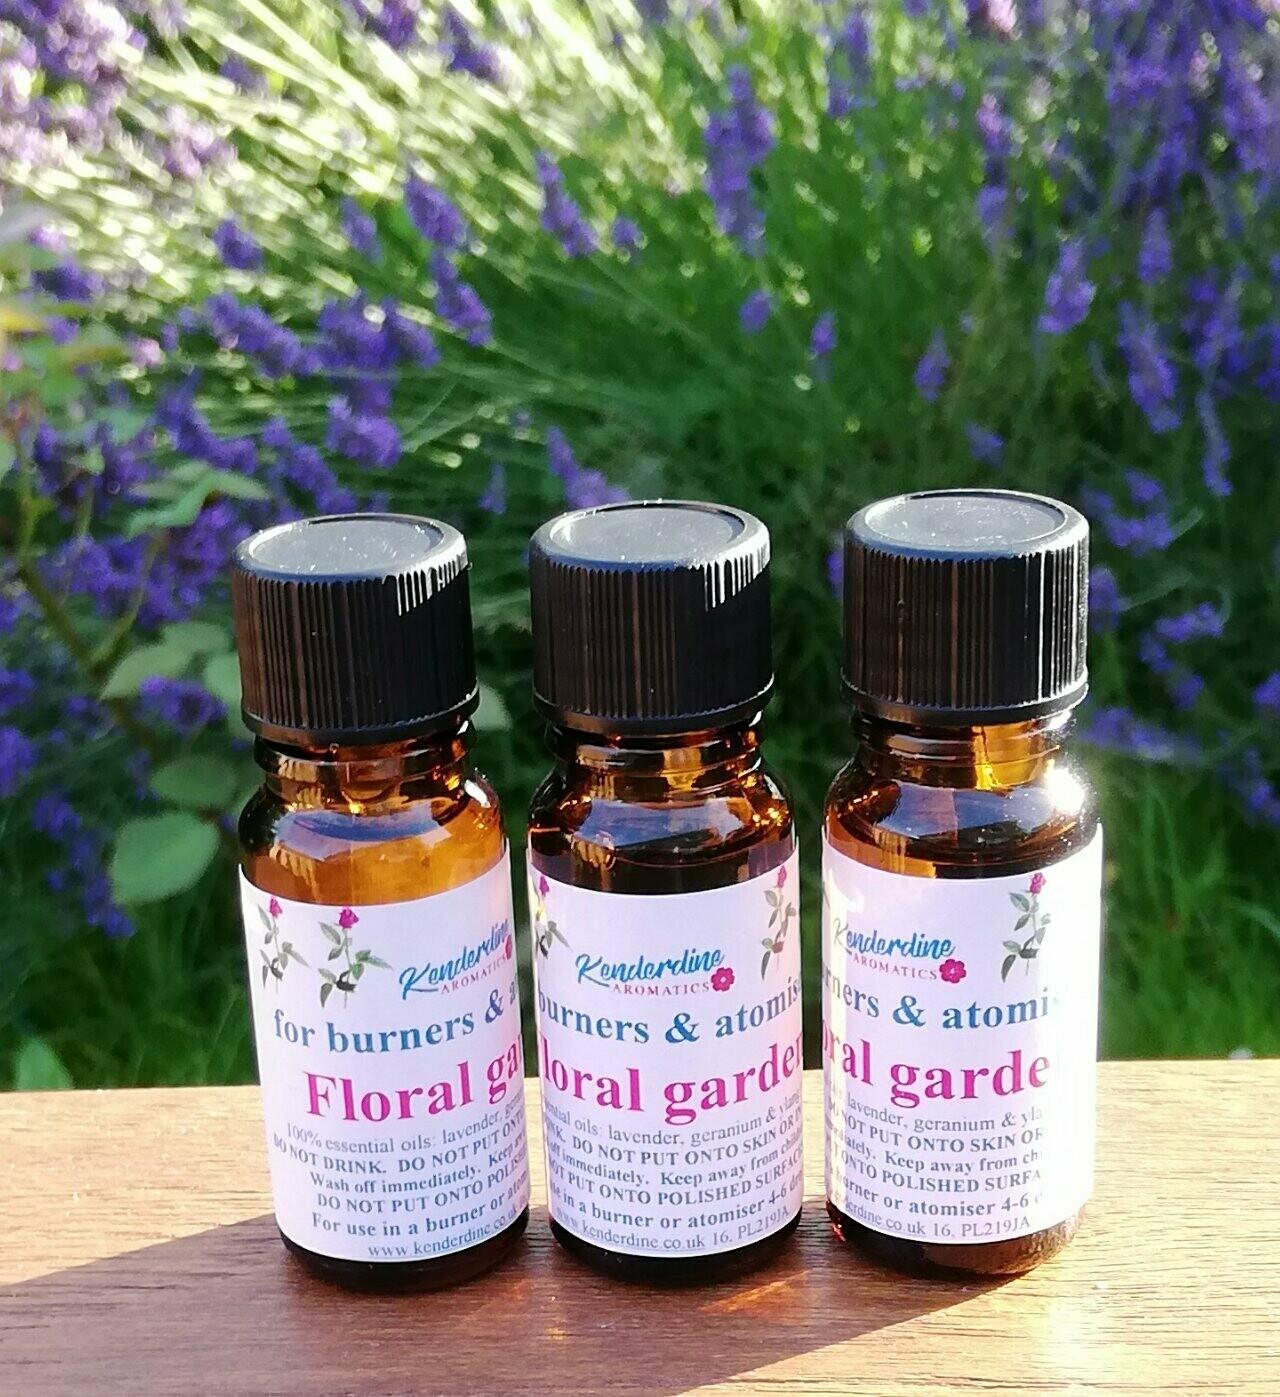 Essential oil blends - Floral garden